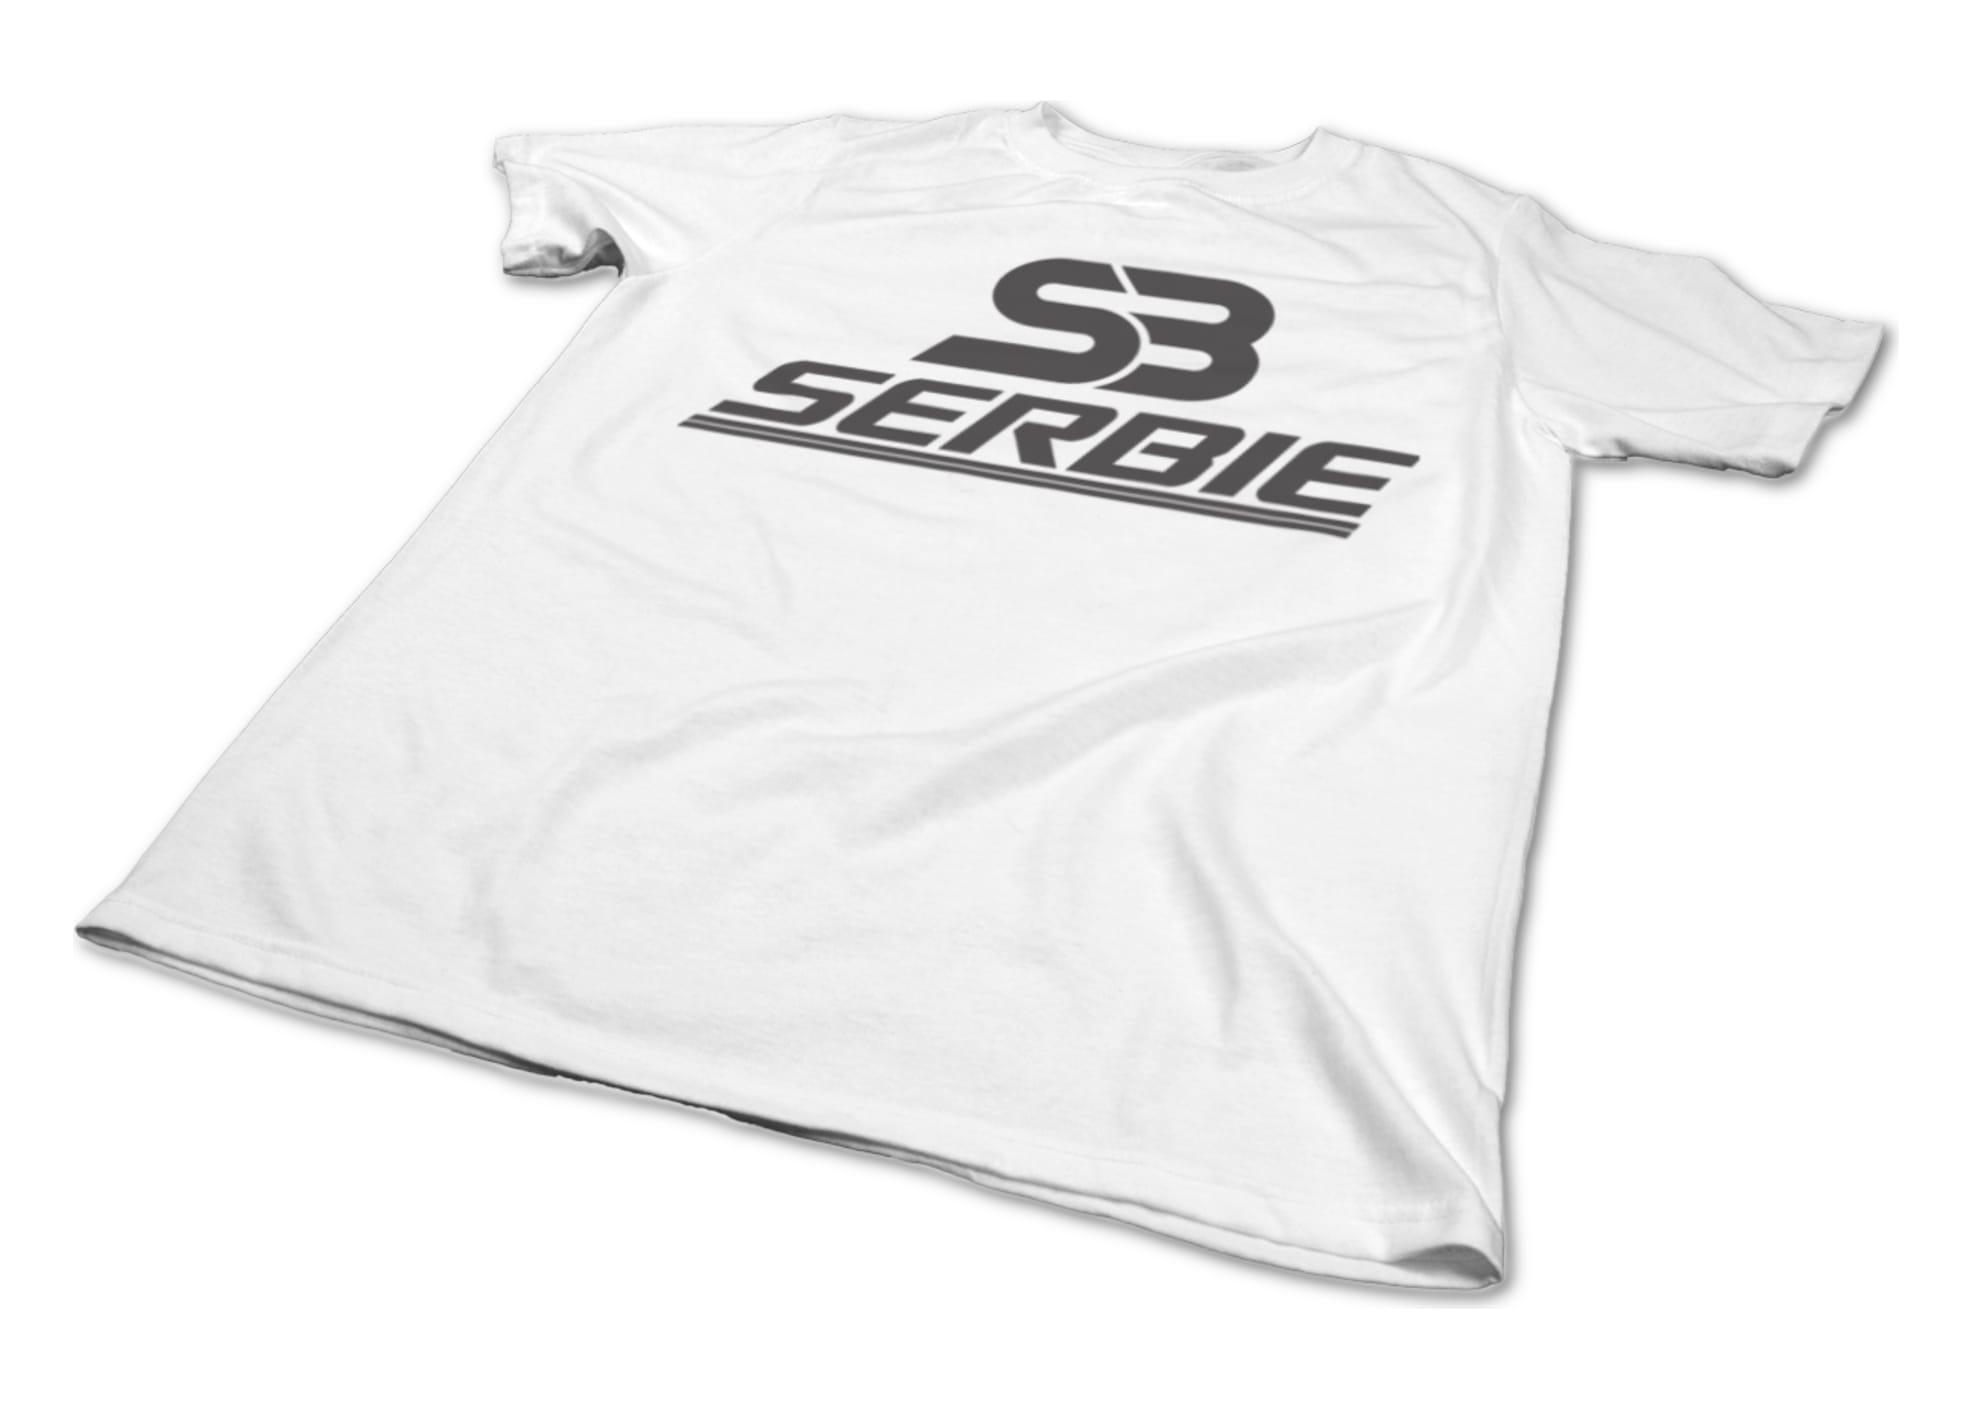 Serbie serbielogo7 1592801722